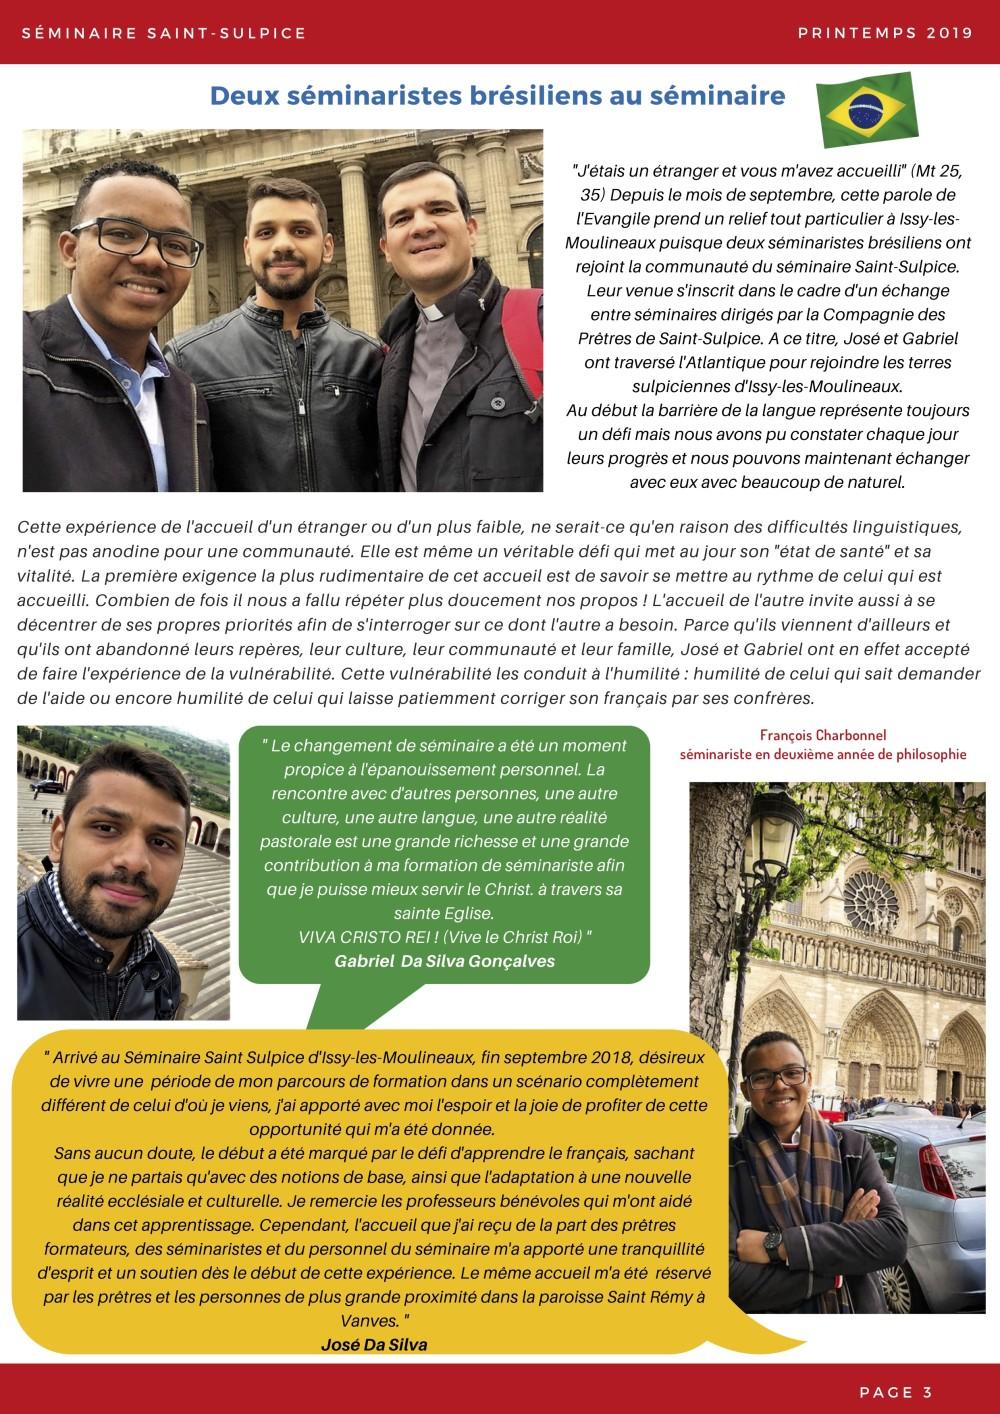 Newsletter Séminaire Saint-Sulpice mai 2019 - p3